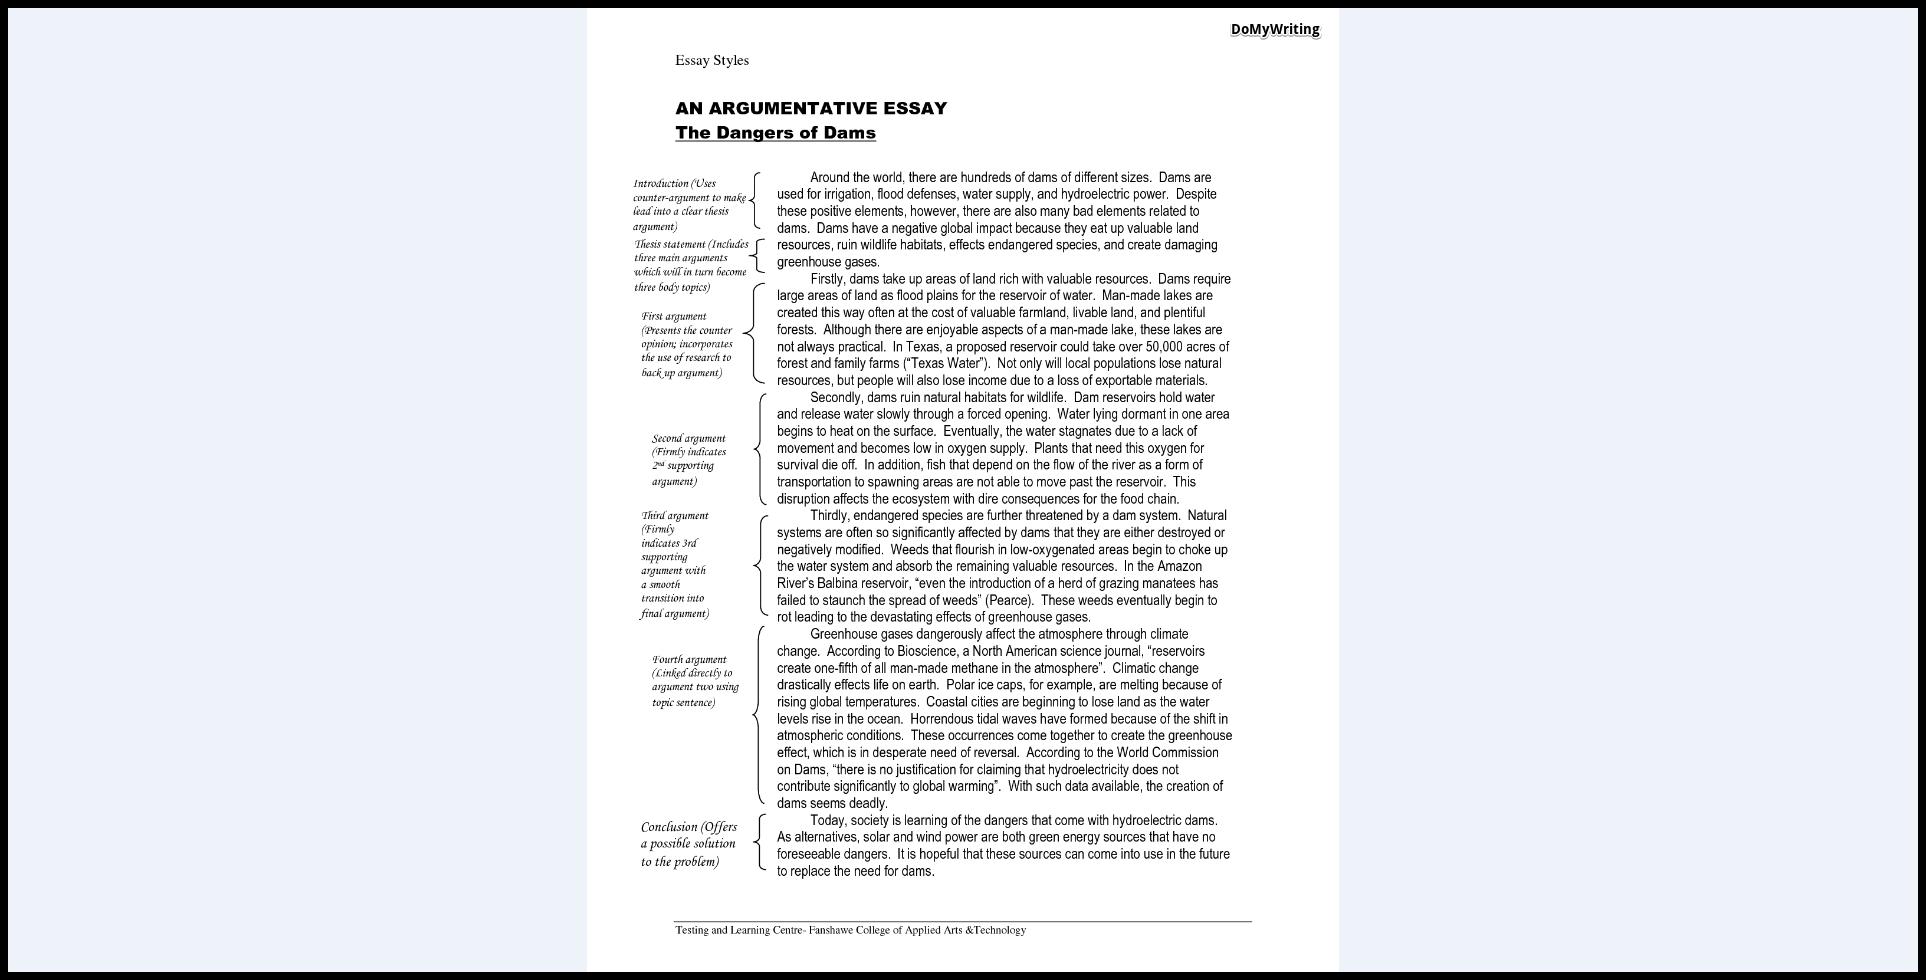 013 Argumentative Research Essay Topicss Singular Topics Interesting For College Students Full